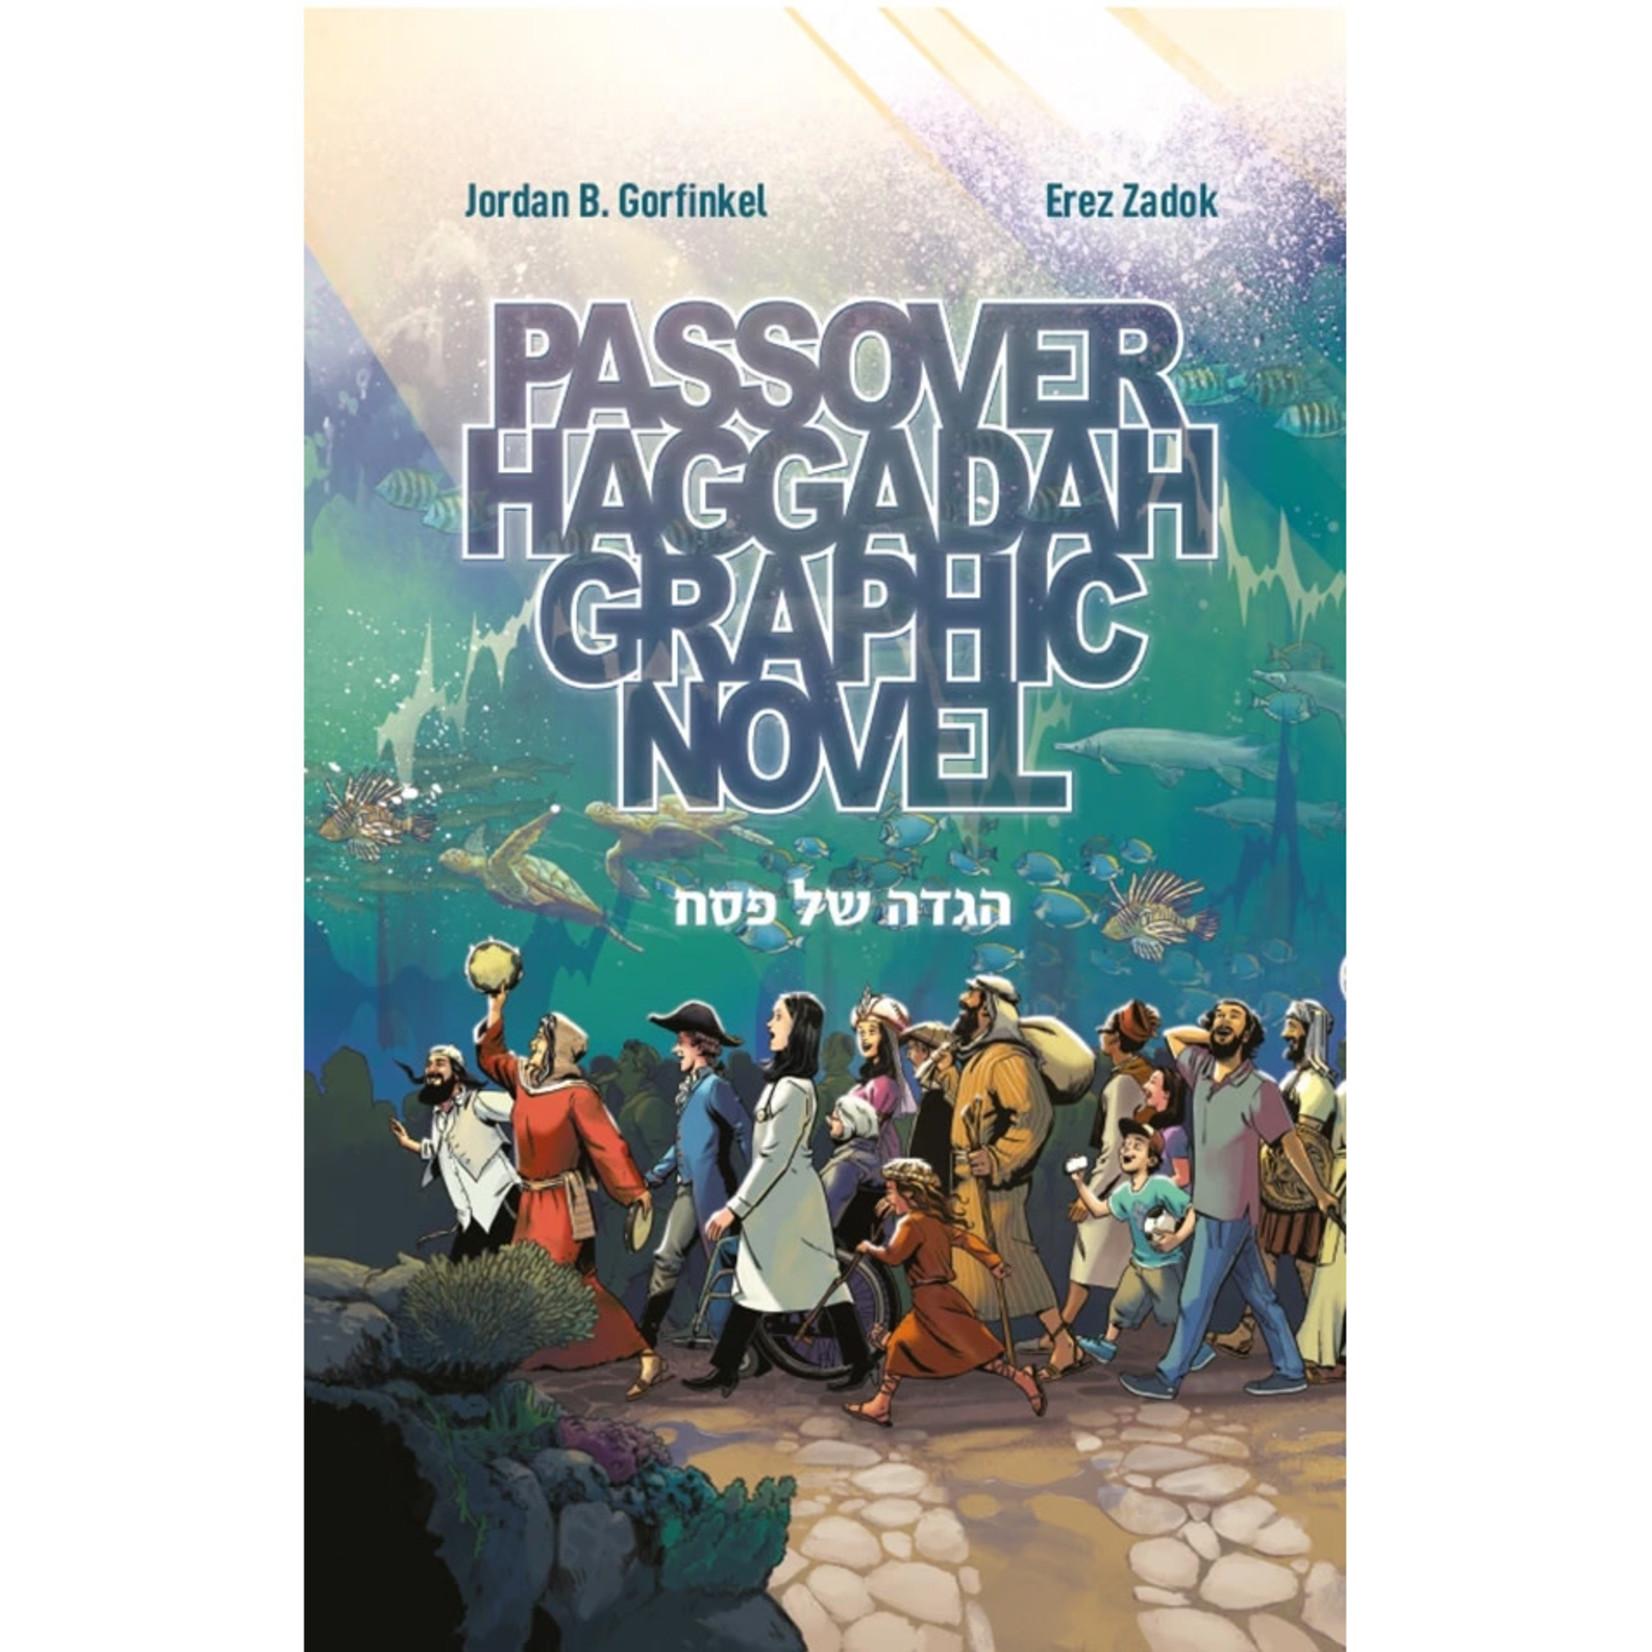 Erez Zadok and Jordan Gorfinkel Passover Haggadah Graphic Novel